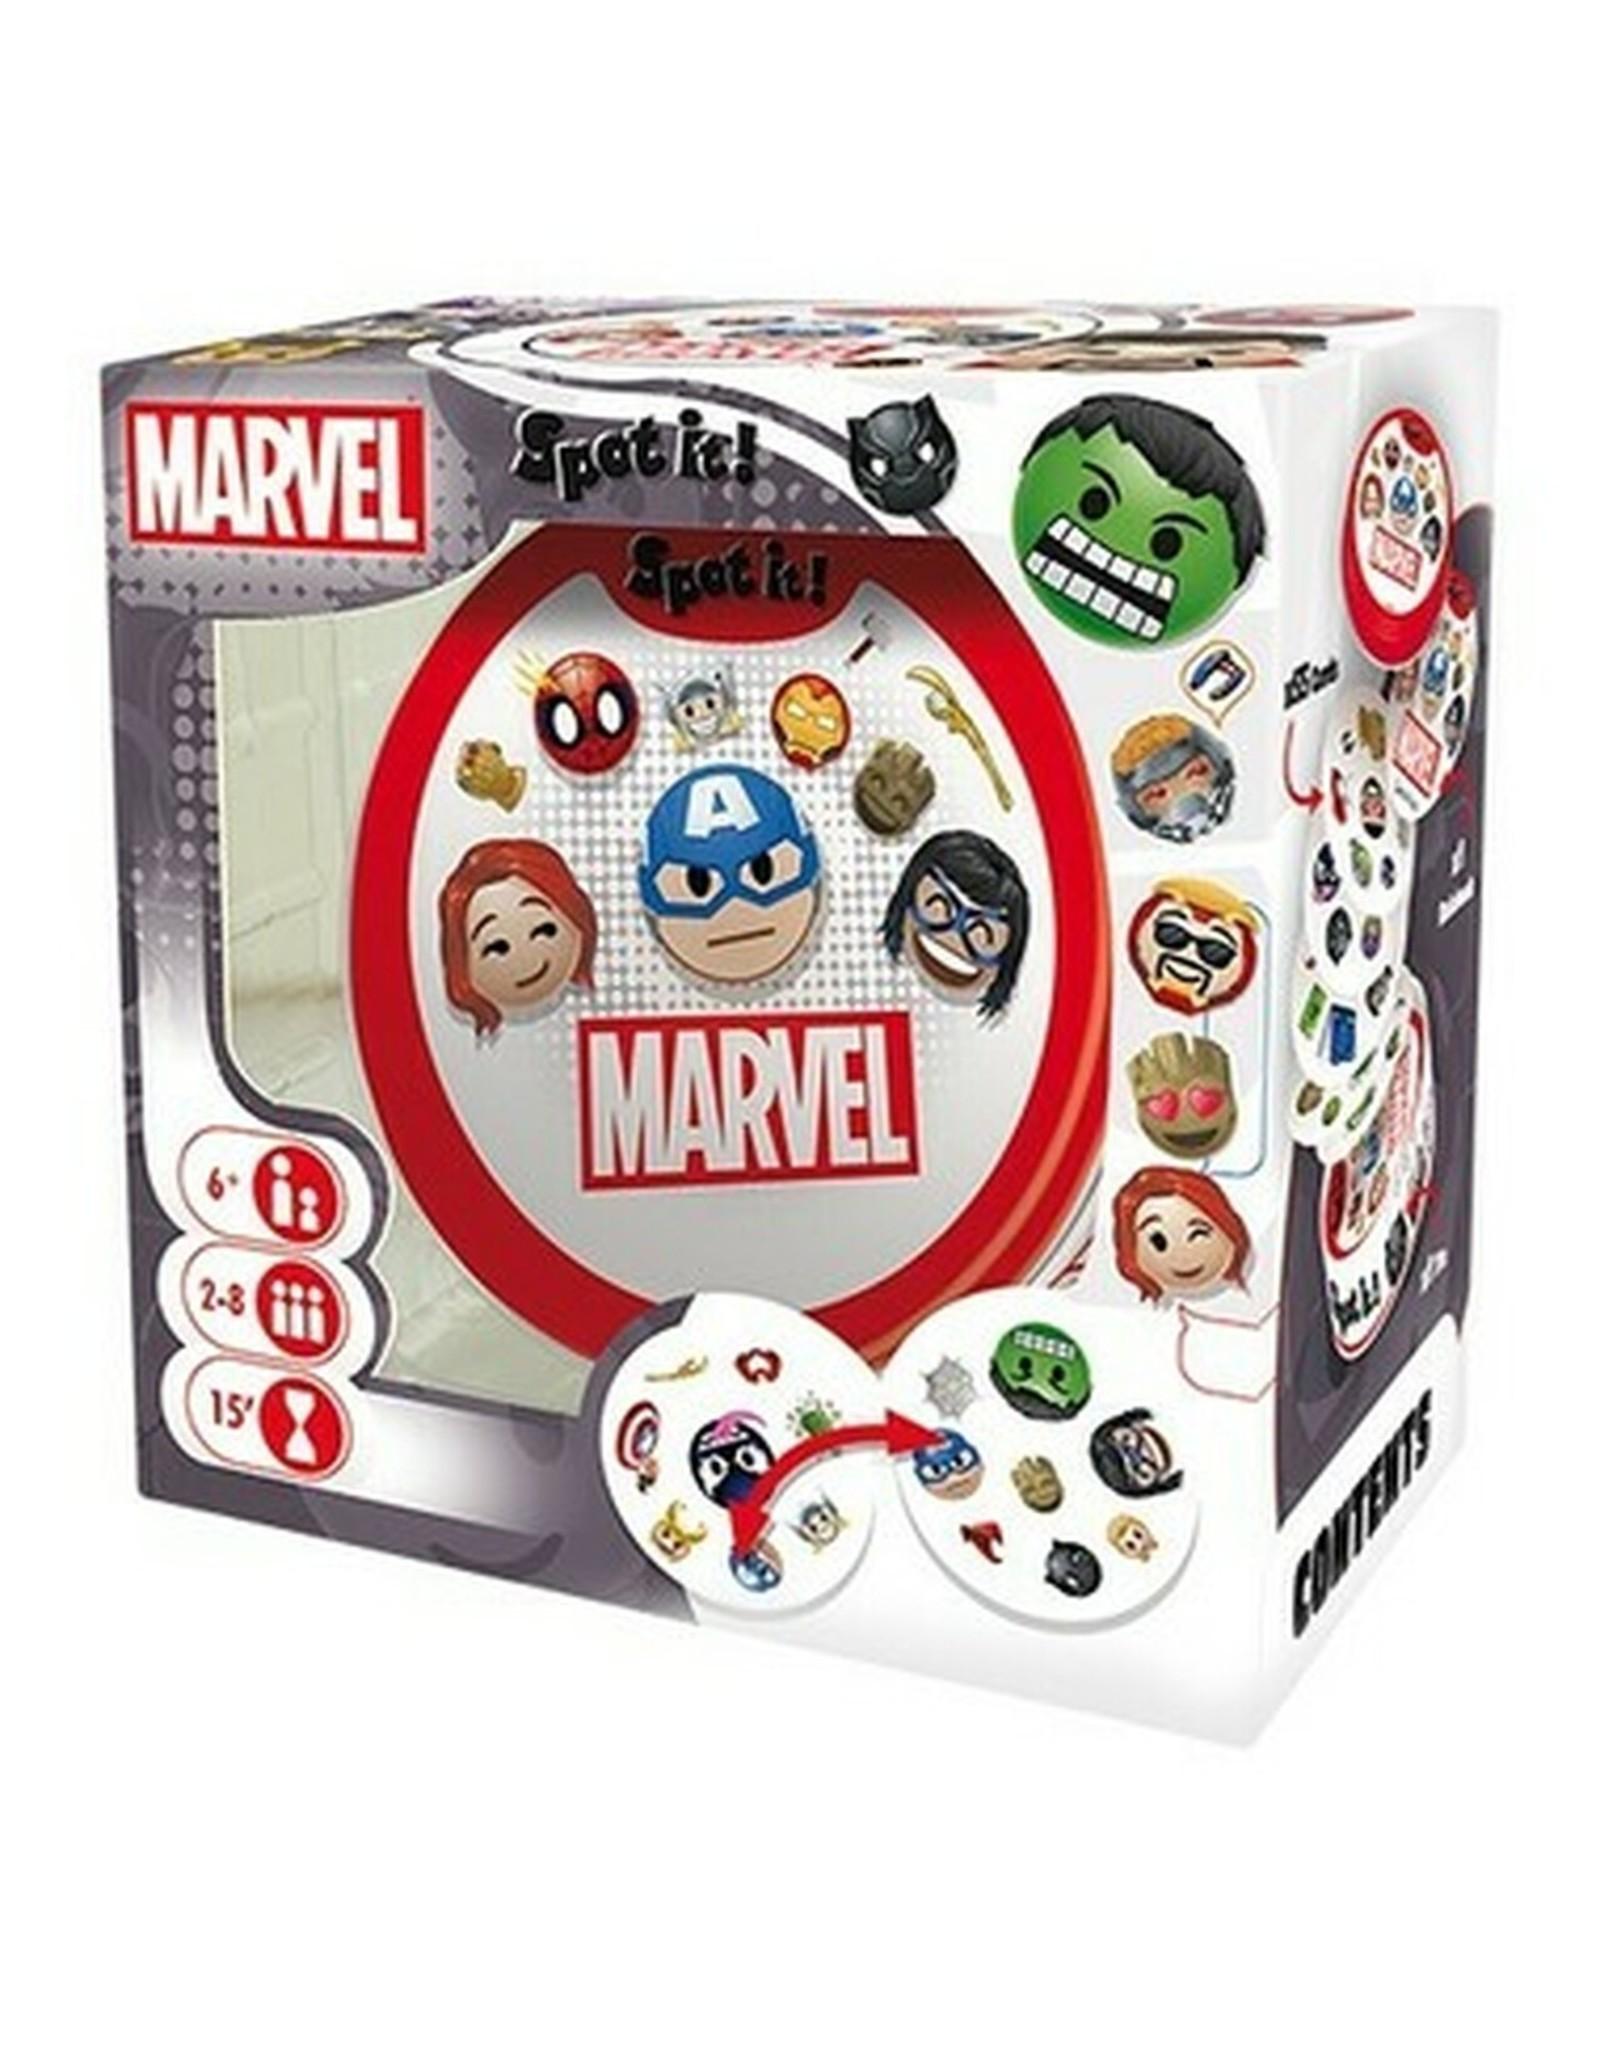 Spot It: Marvel